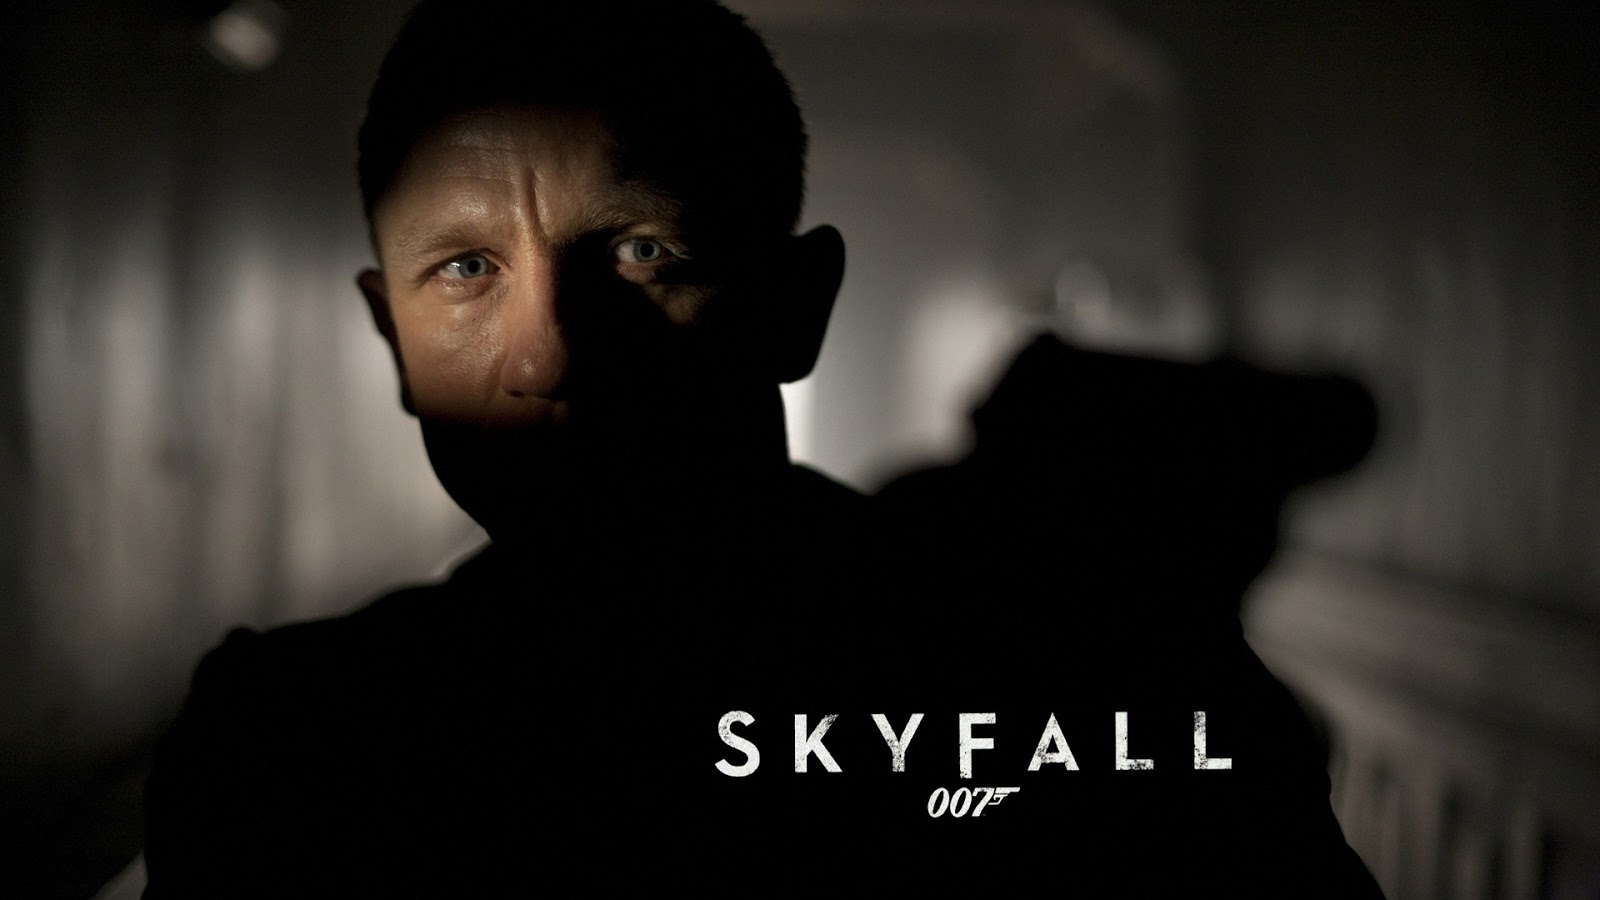 Hd wallpapers for iphone 5 james bond 007 skyfall - 007 wallpaper 4k ...